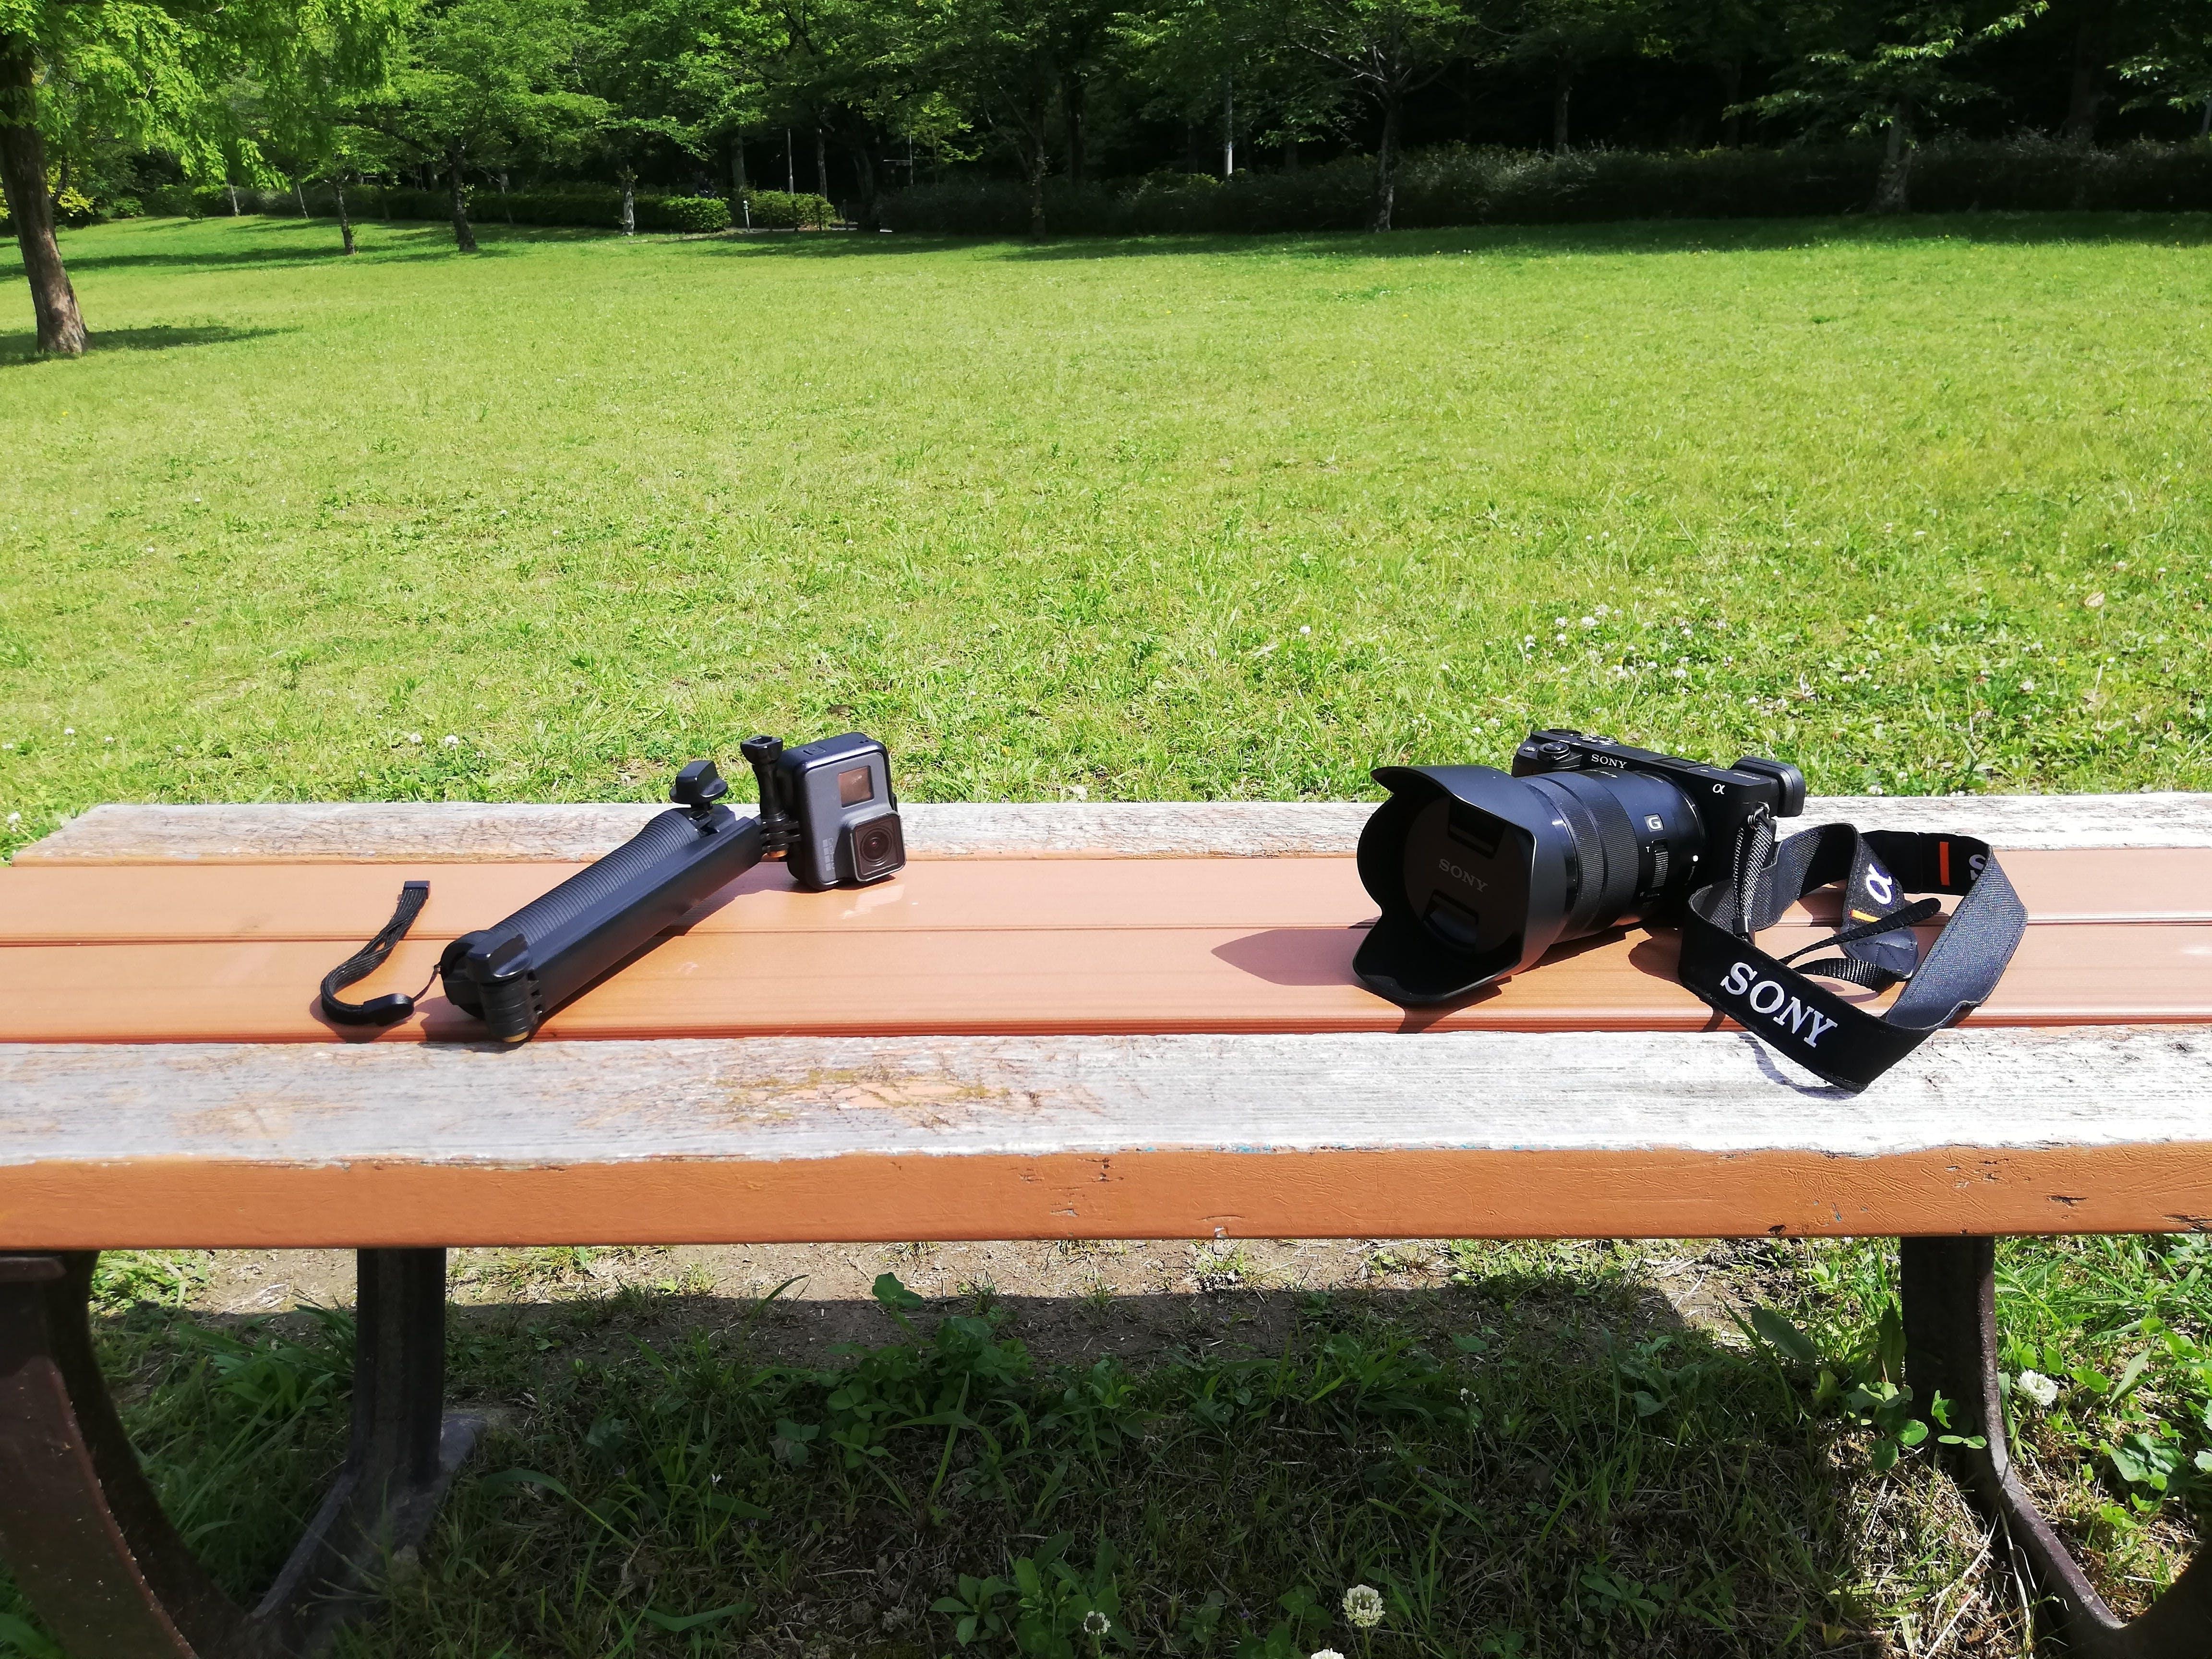 GoProとSONYのカメラが相棒です。